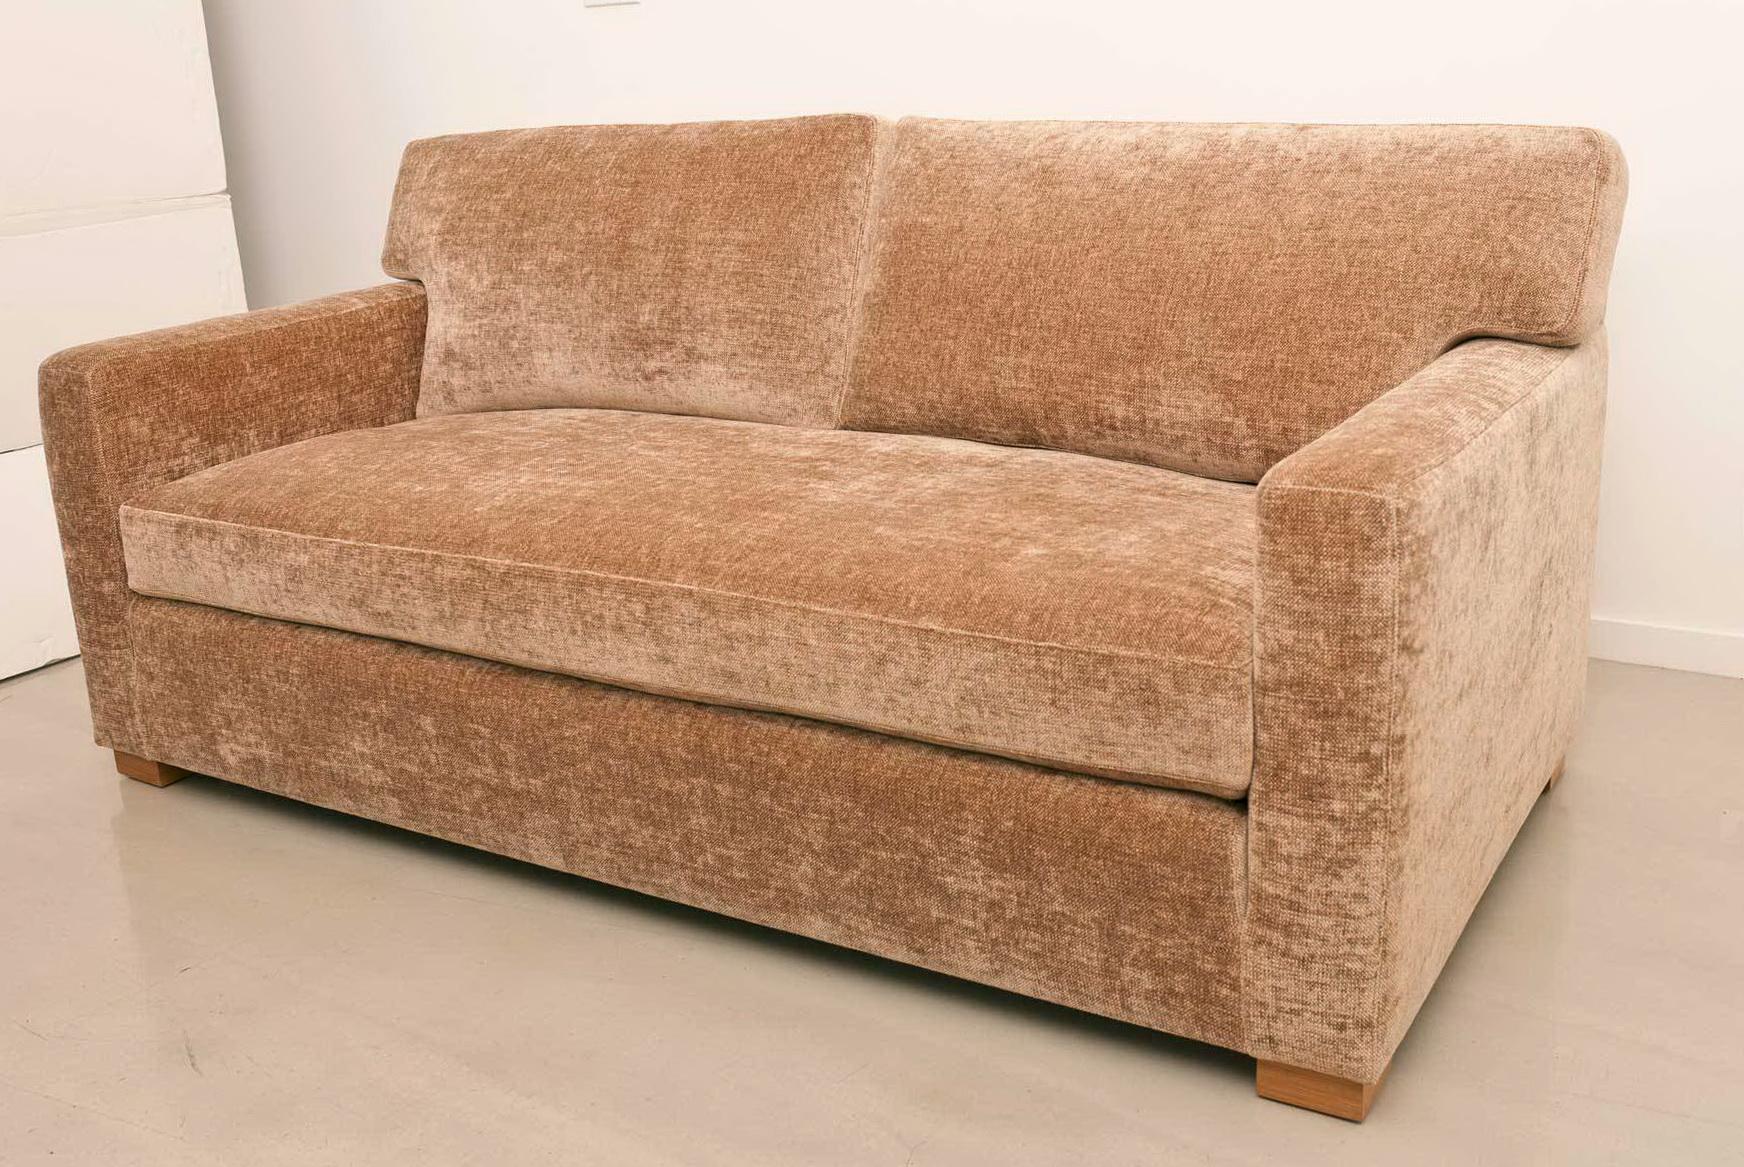 Sofa Cushion Foam For Sale